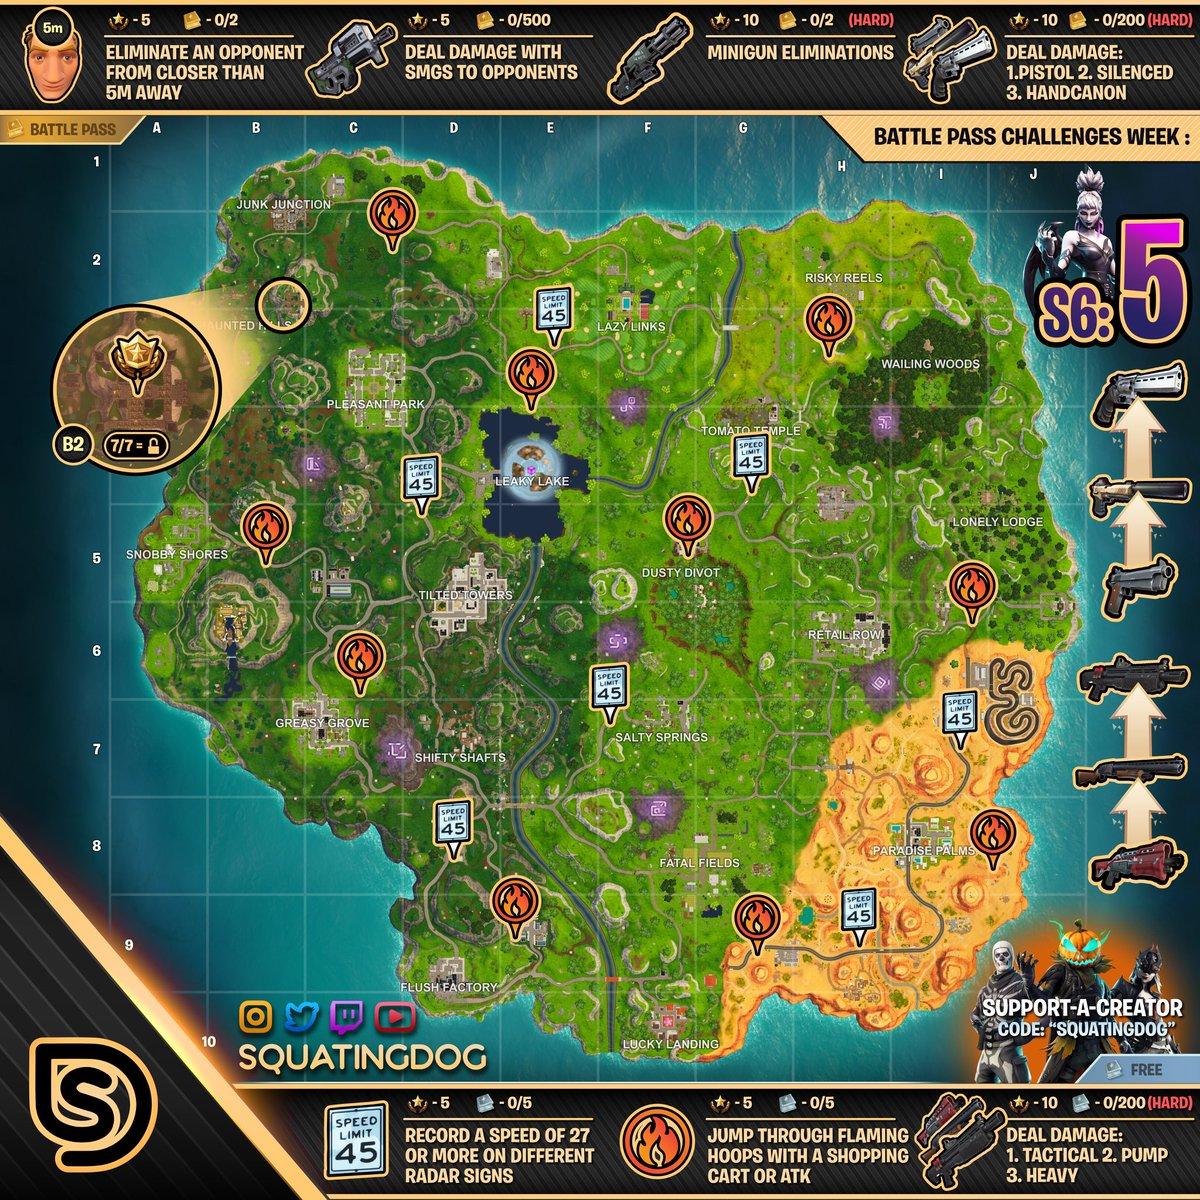 Cheat Sheet Fortnite Season 6 Week 5 Challenges